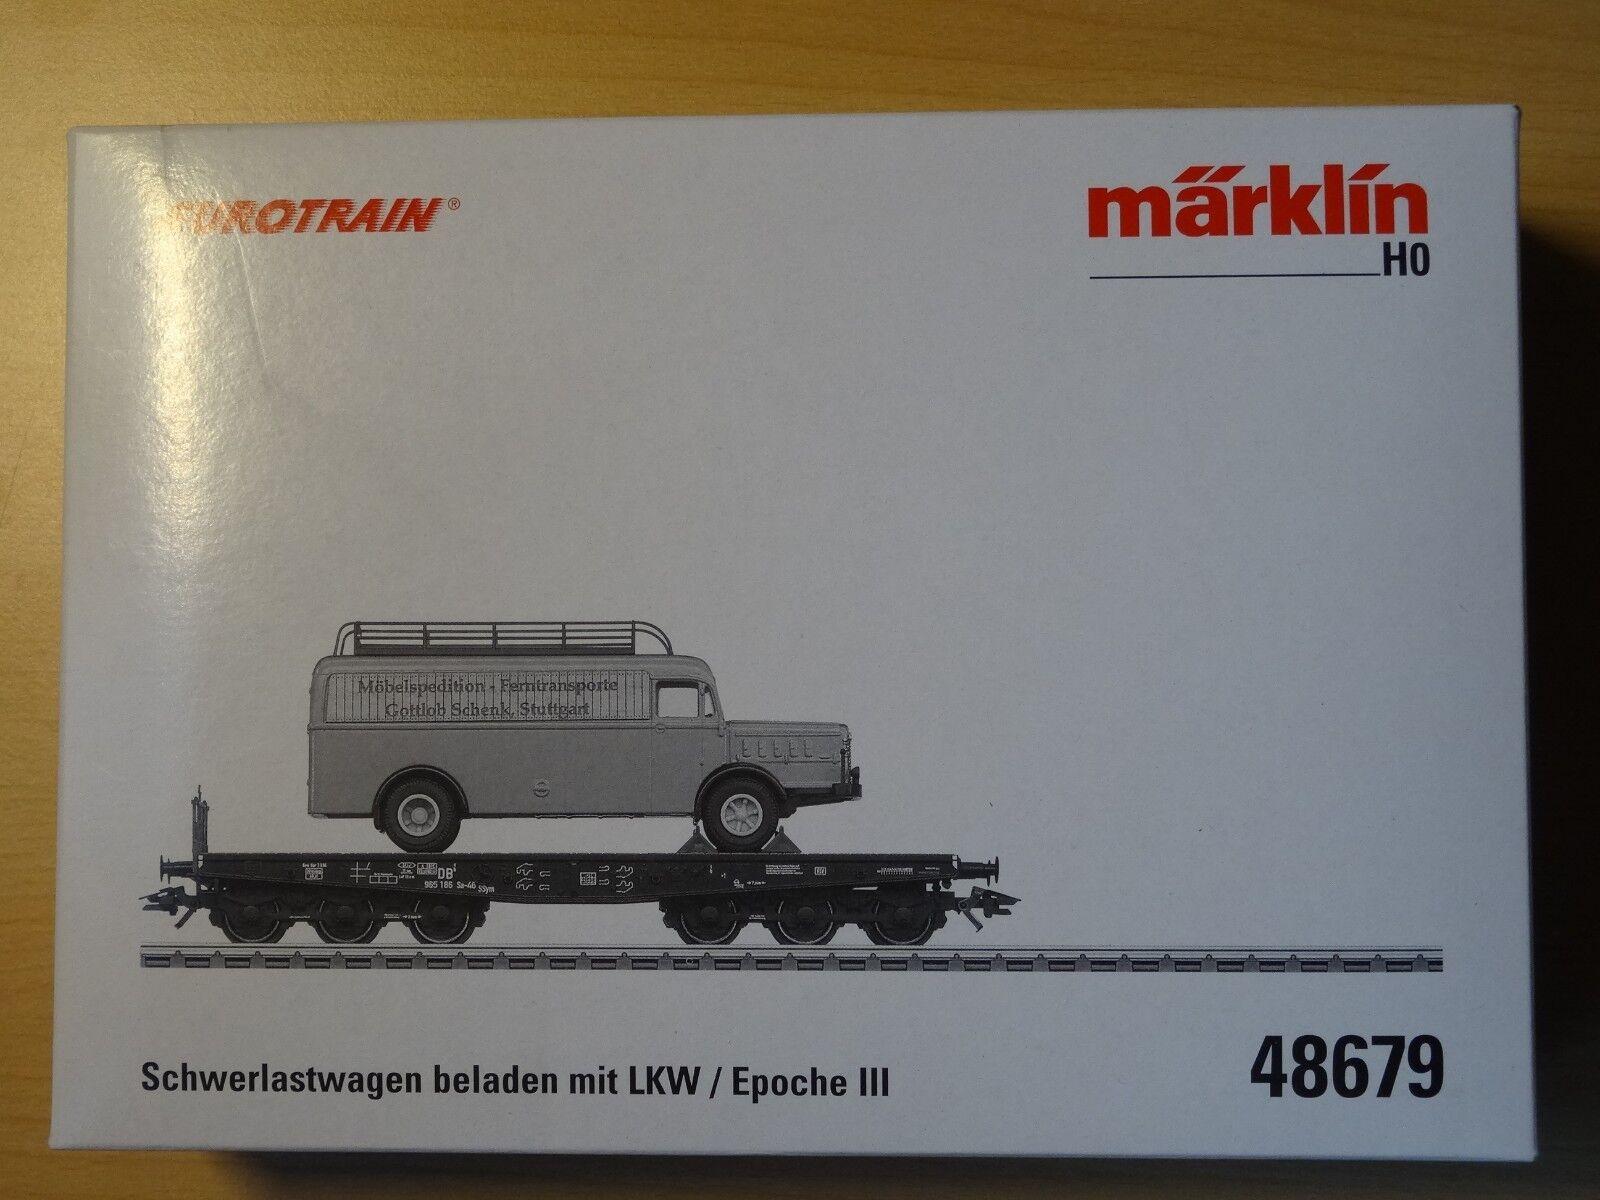 marklin HO ART 48679 pesanti con camion NeuwOrgKT